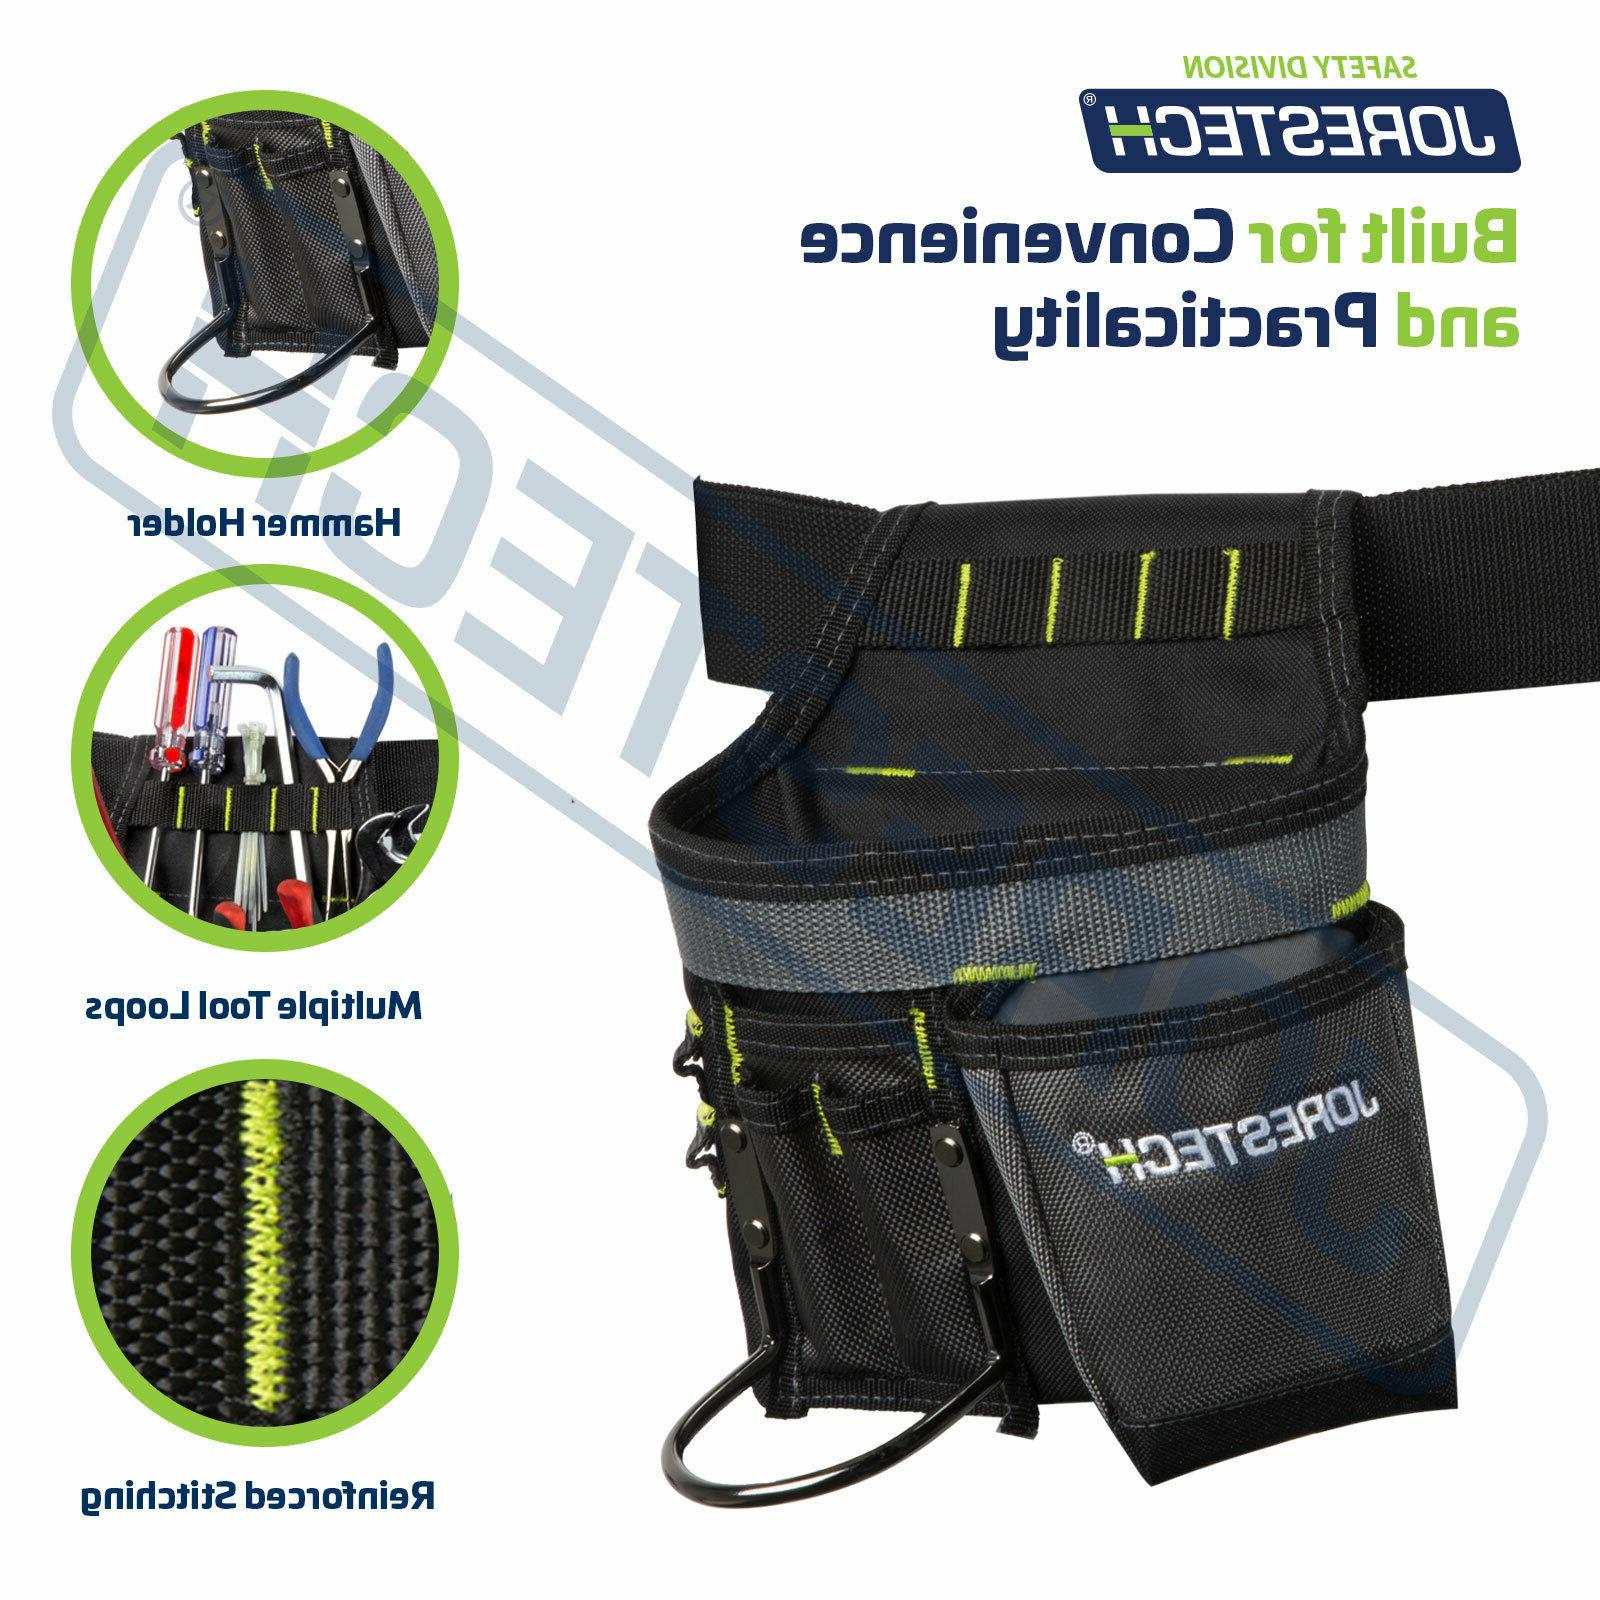 Electrician Tool Bag 5 Pocket Holder JORESTECH